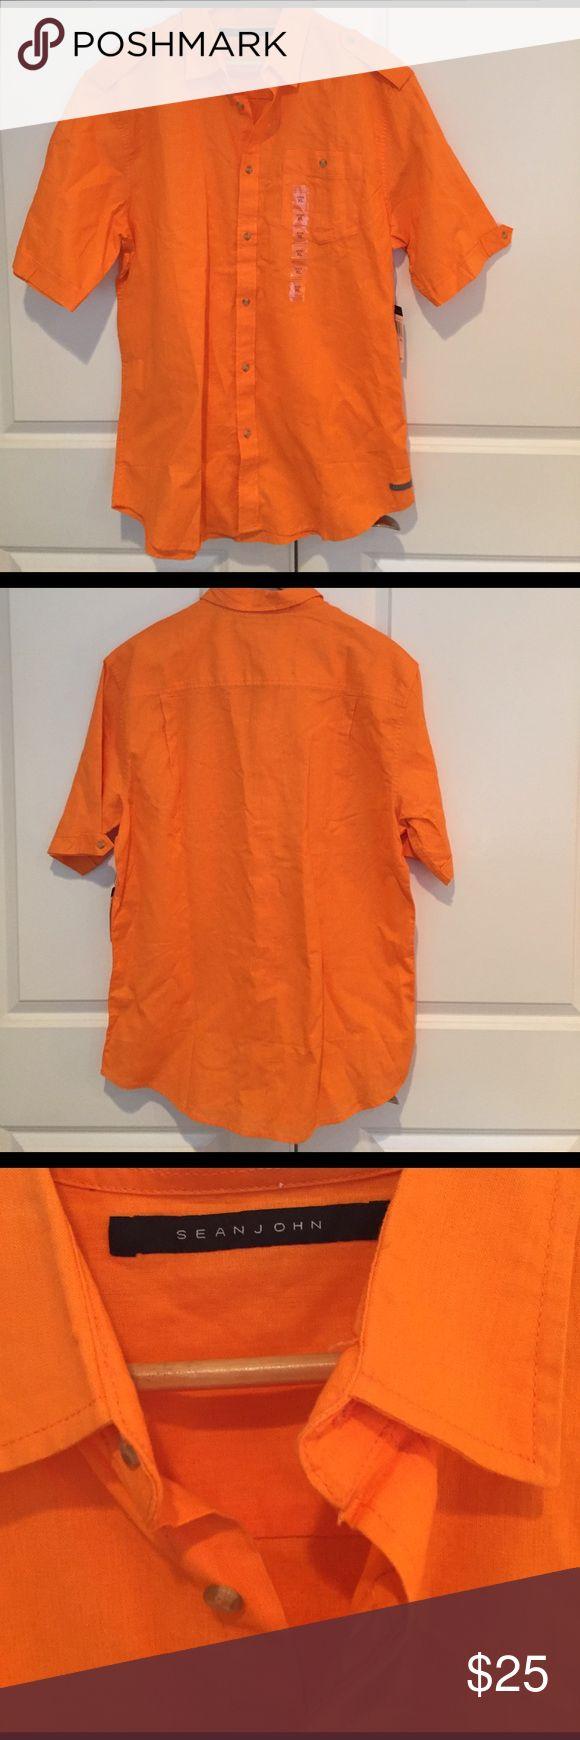 Men's short sleeve shirt linen-cotton blend Sean John short sleeve shirt 55% Linen and 45% cotton Vibrant Orange XL new with tag Sean John Shirts Casual Button Down Shirts